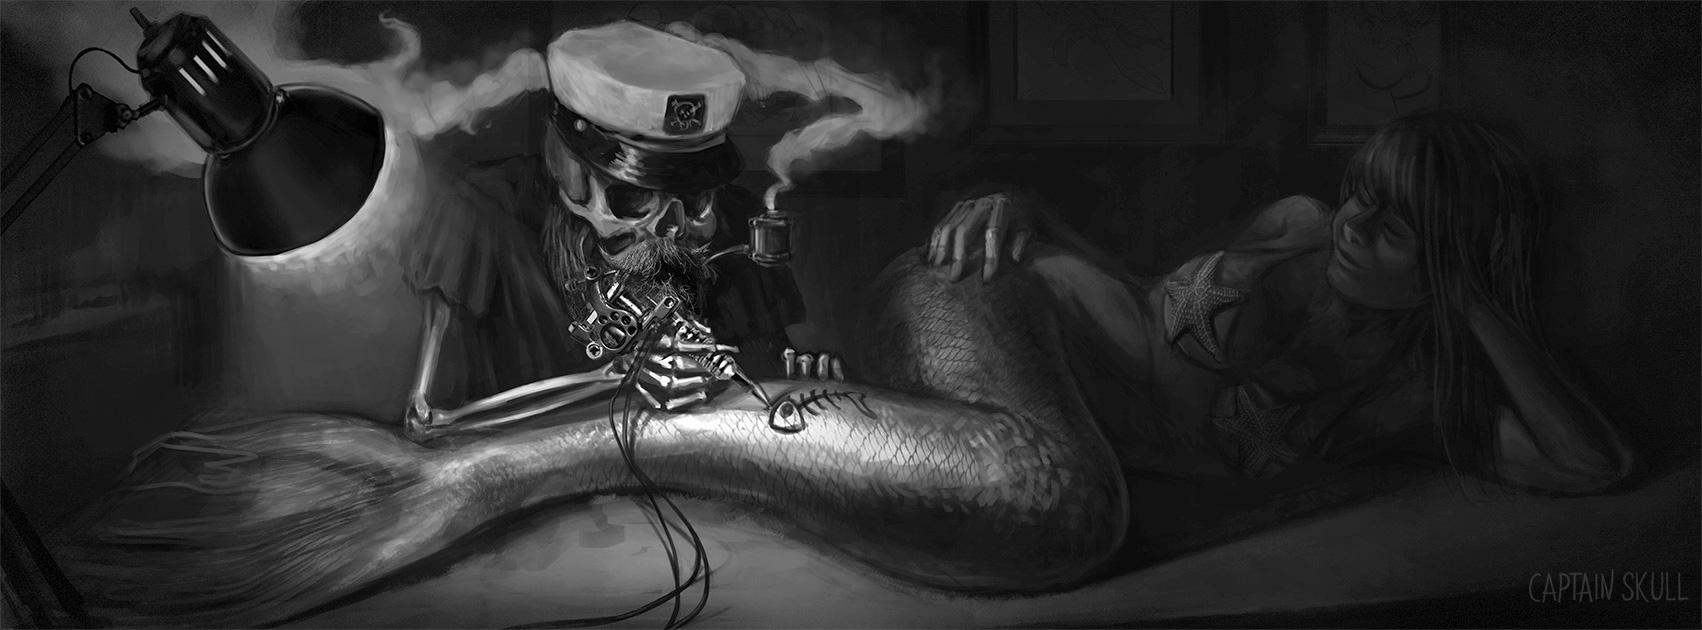 Cpt. Skull working